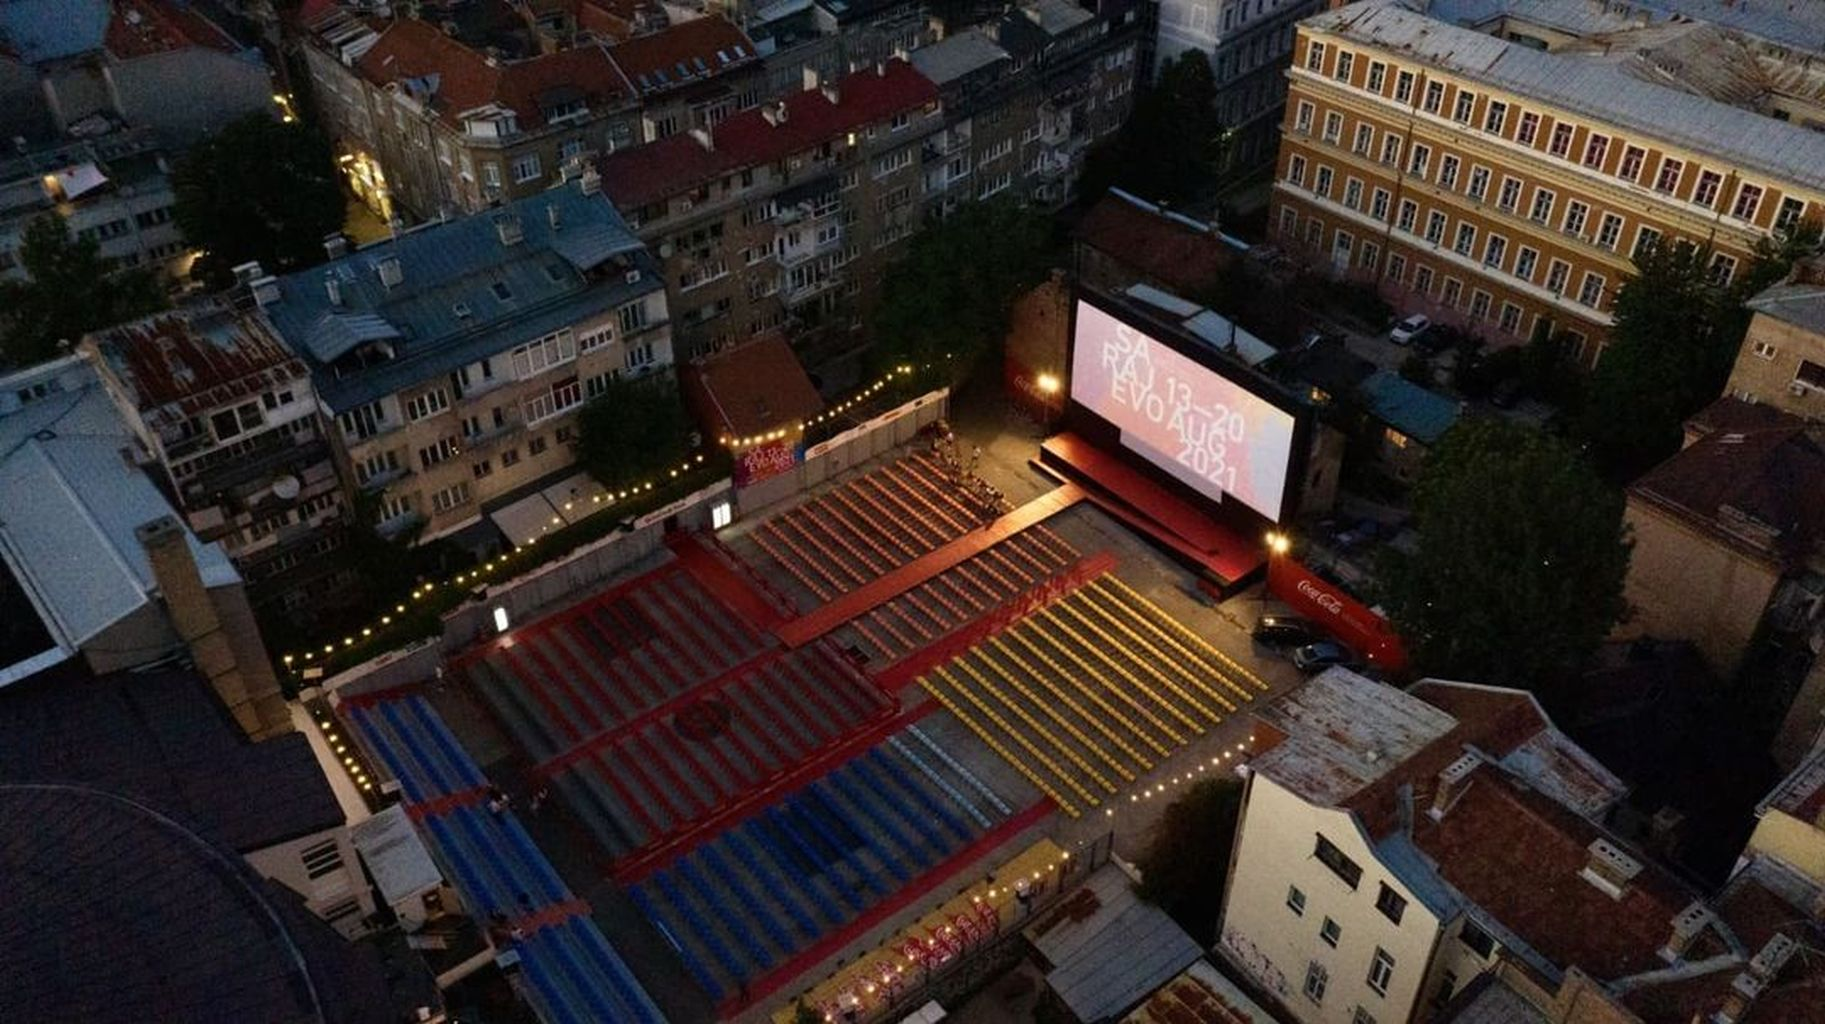 Danas počinje 27 sarajevo film festival